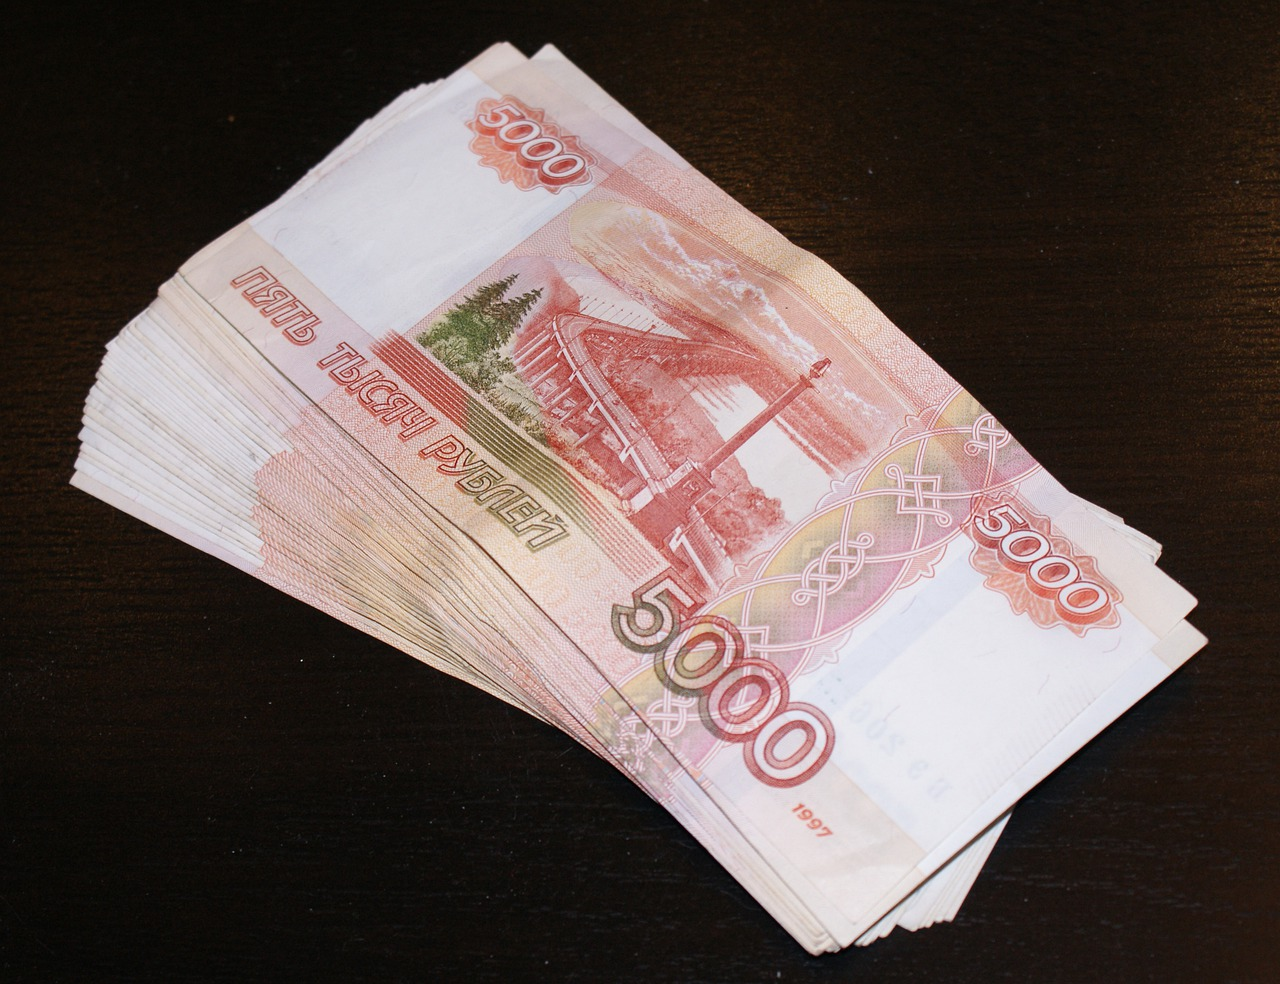 Лжесотрудница банка украла 750 тыс. рублей у ростовчанки